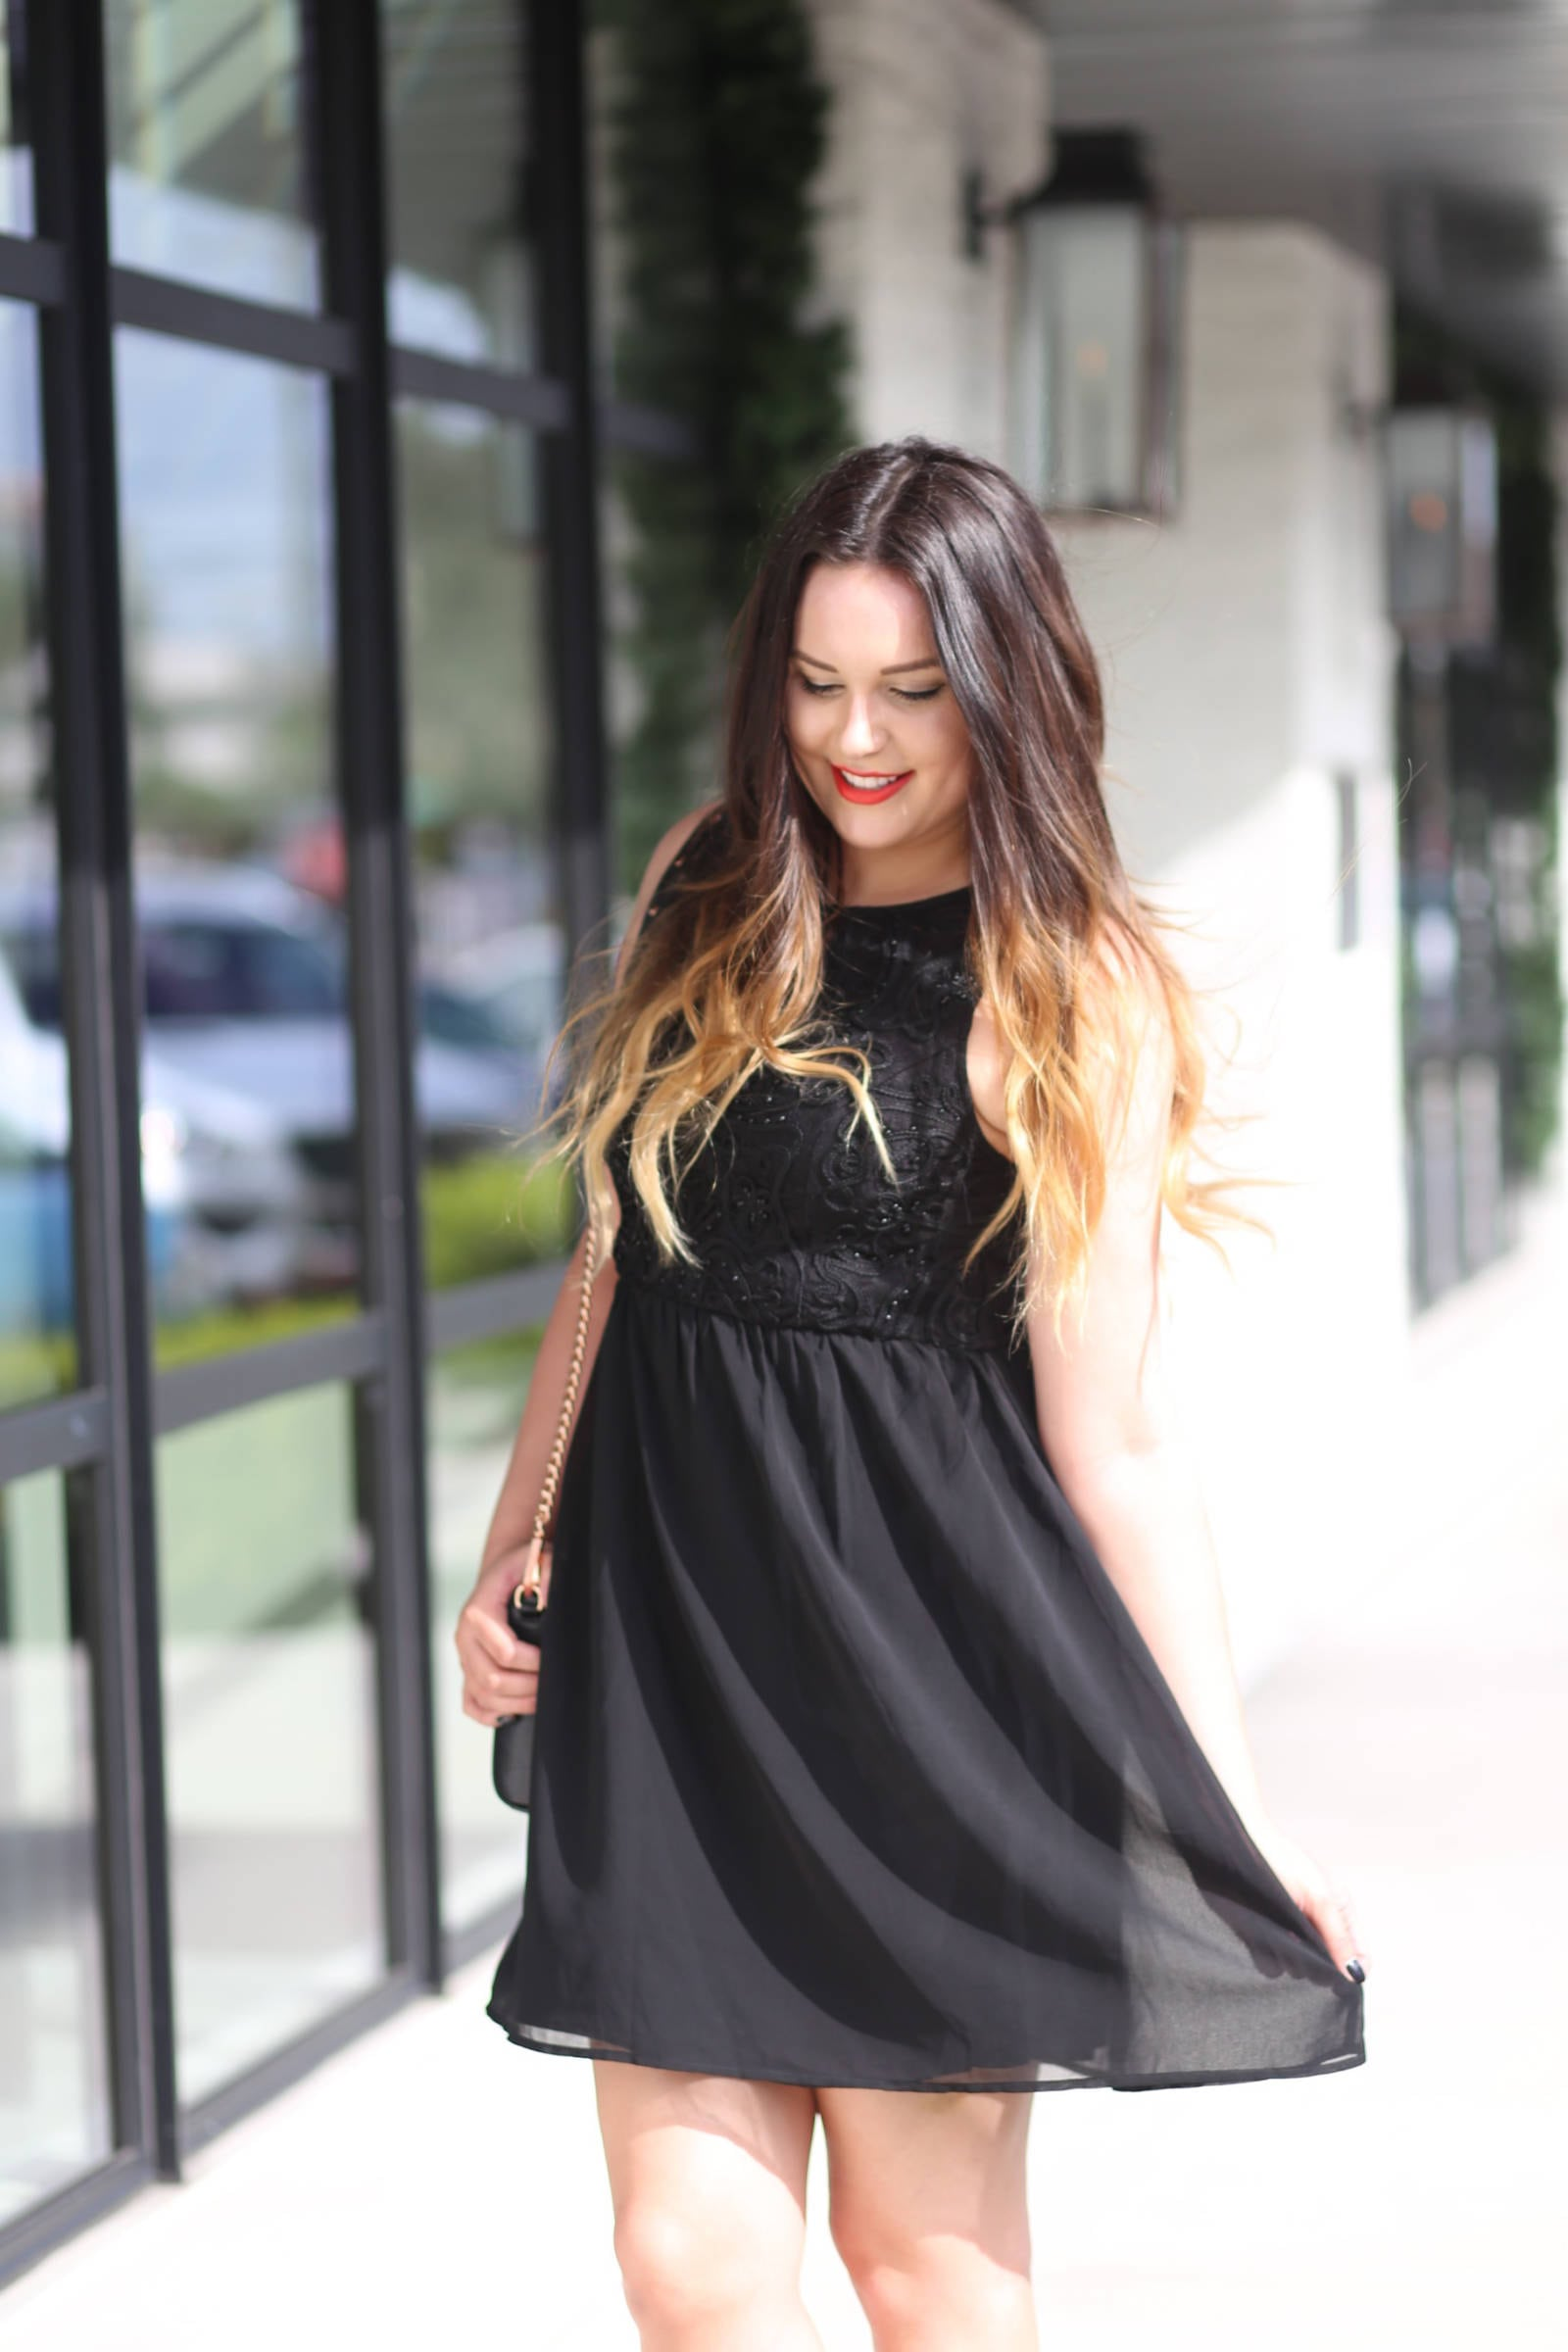 Mash Elle beauty blogger | LBD | little black dress | dresses | cute dress